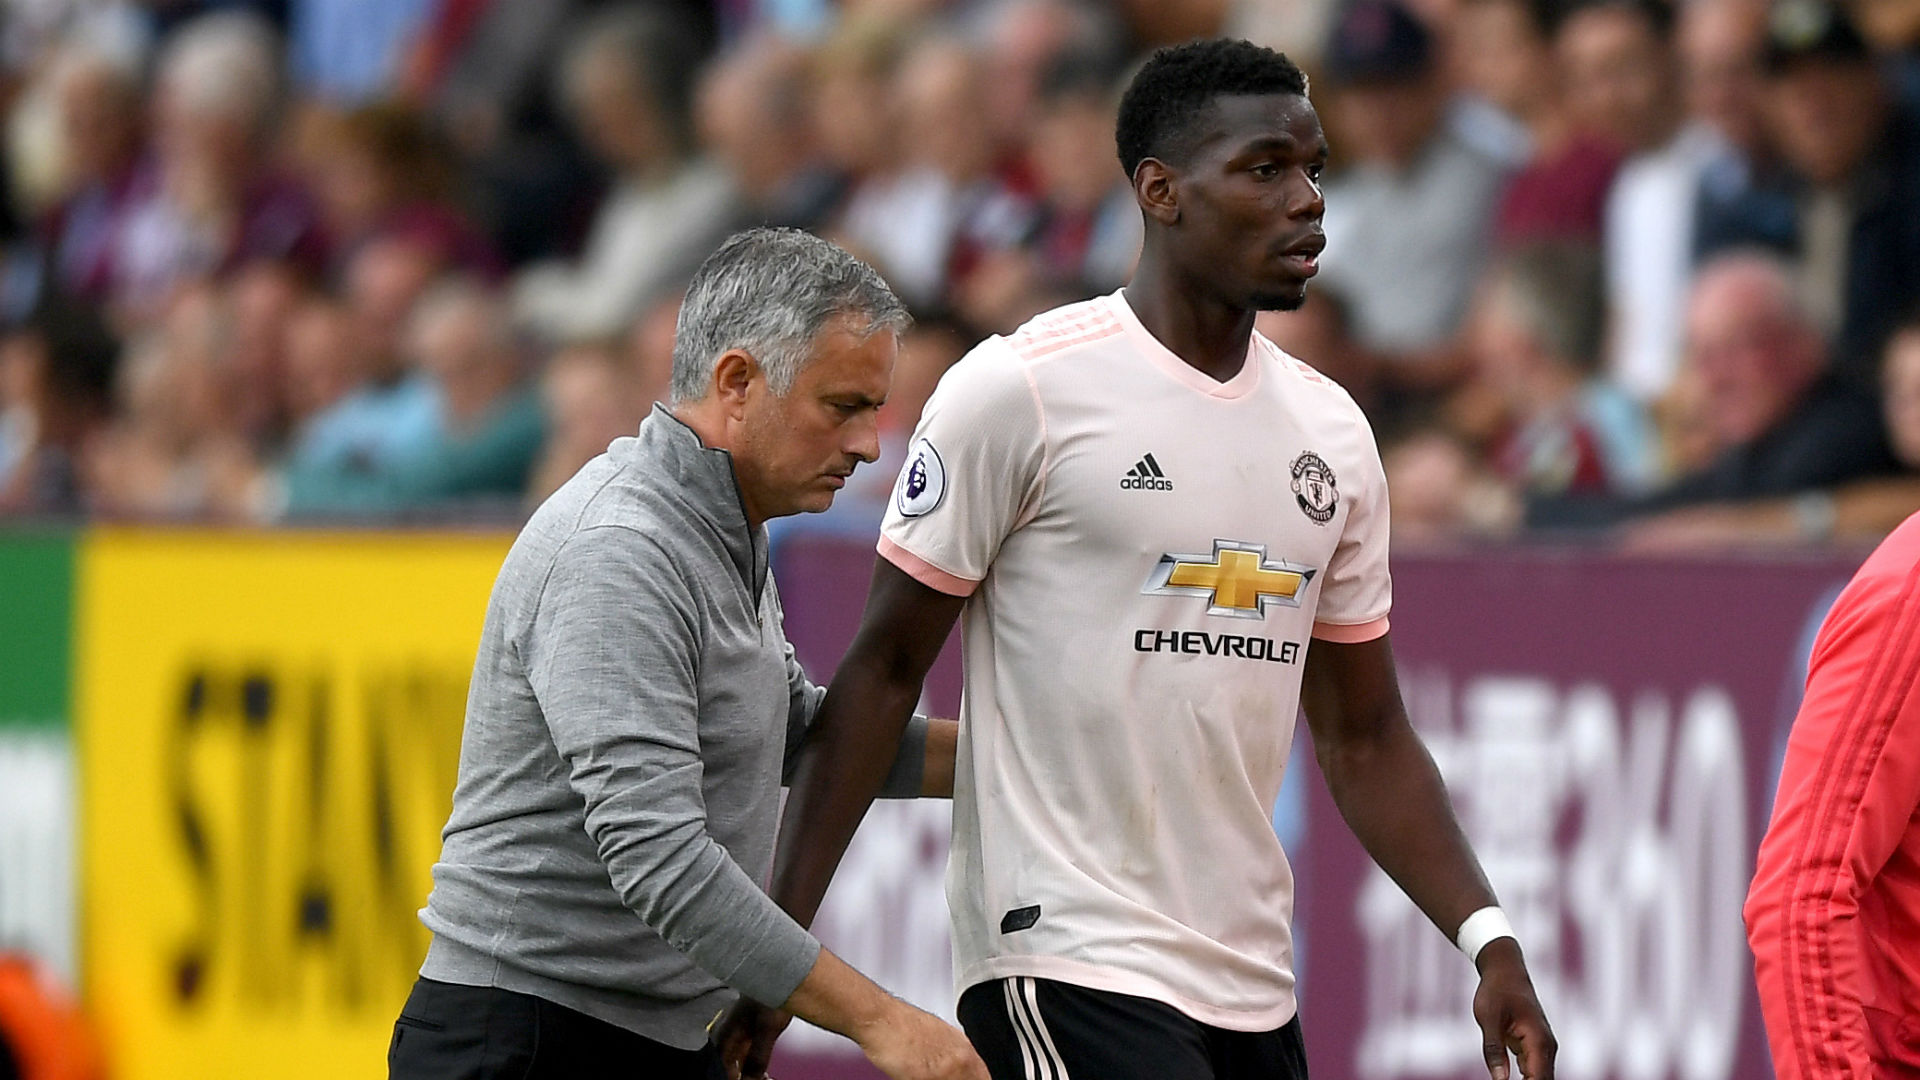 Blame Manchester United players for José Mourinho's exit - Nemanja Matic